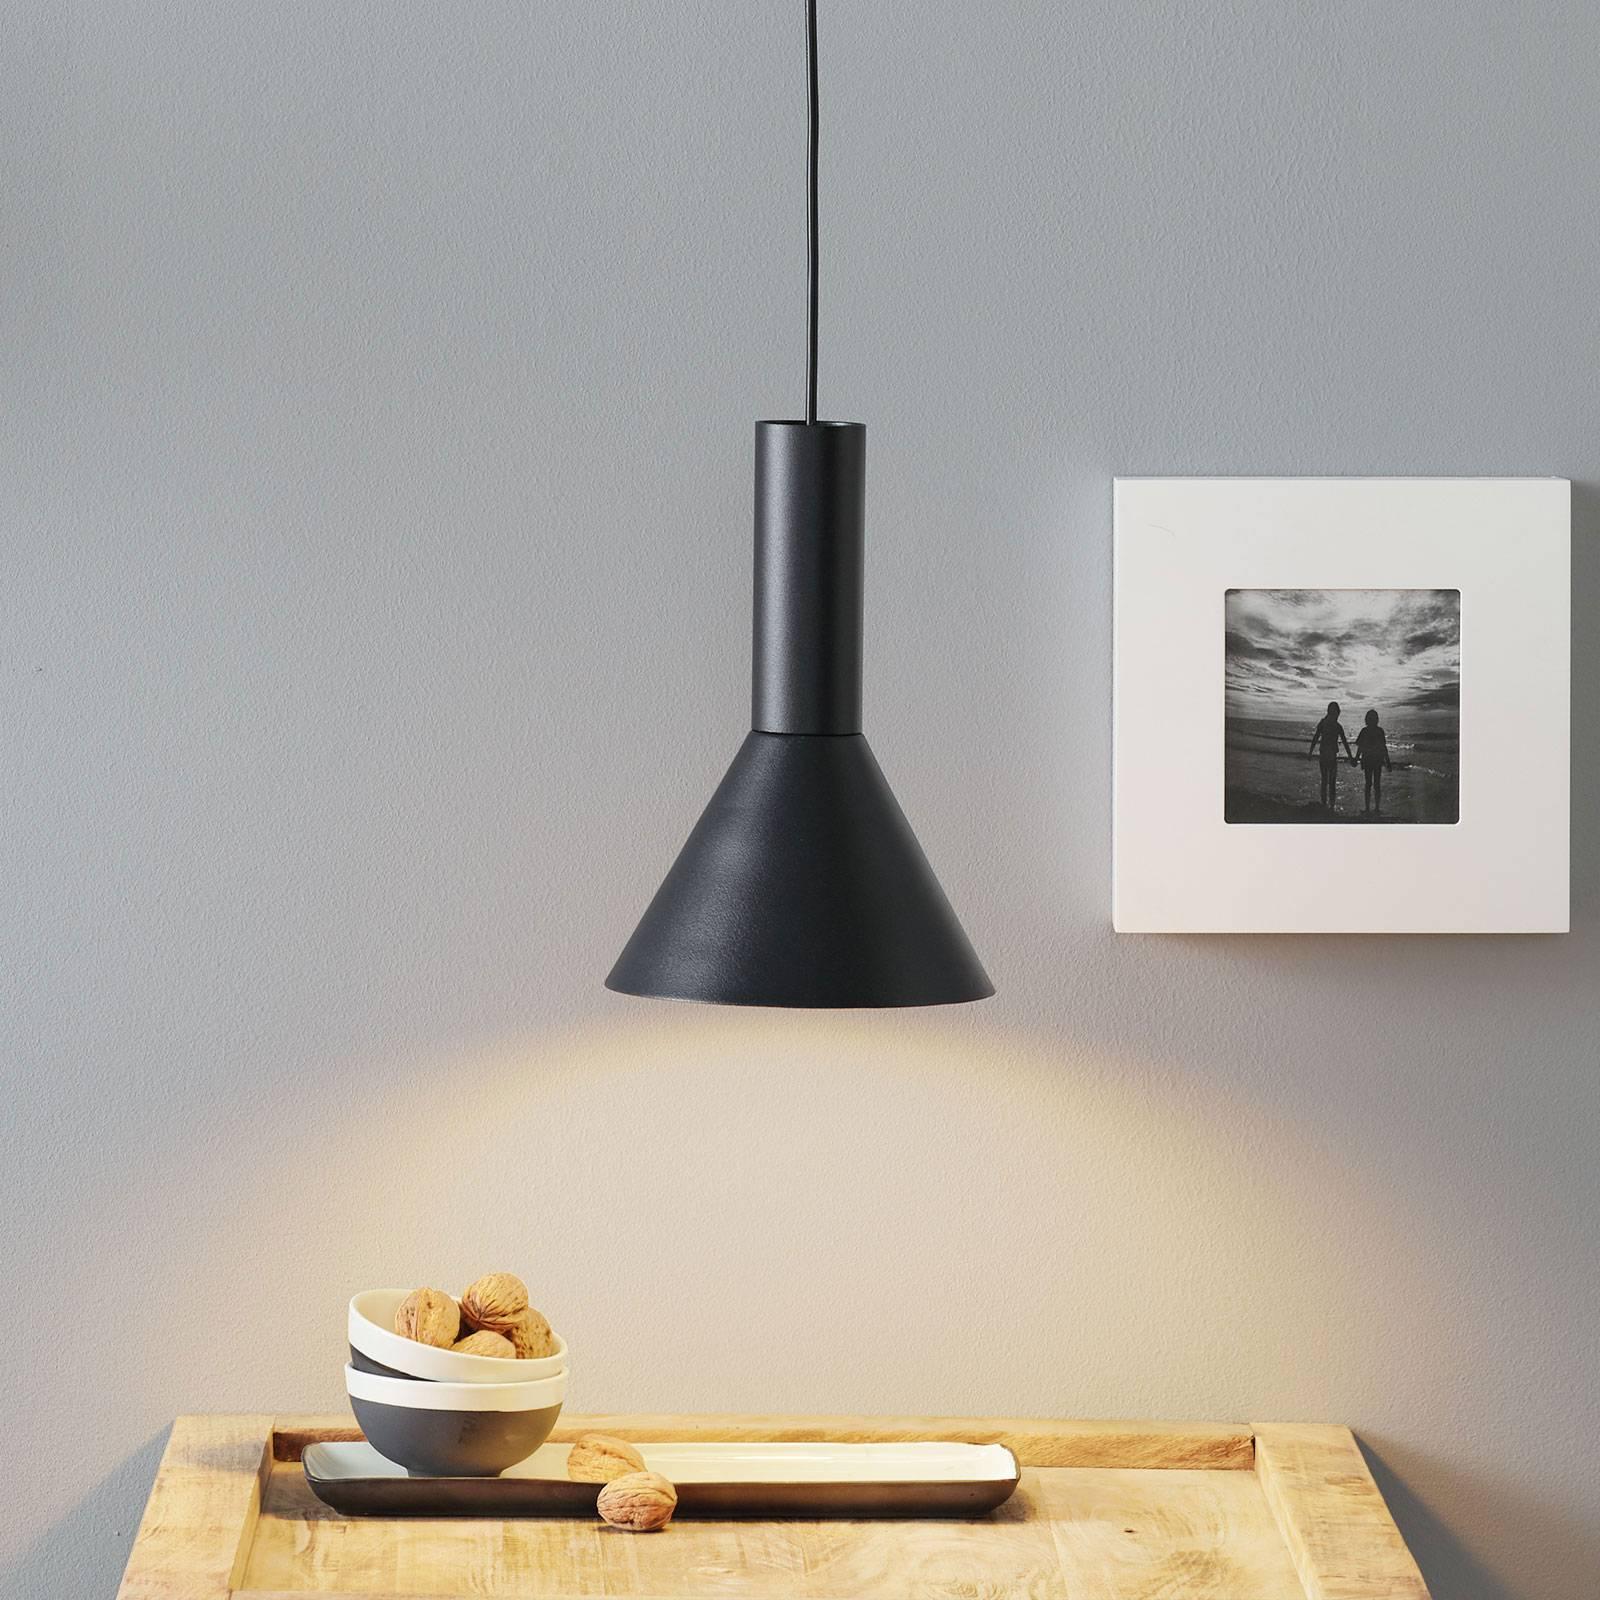 Lucande Caris hanglamp Ø19cm zwart/goud